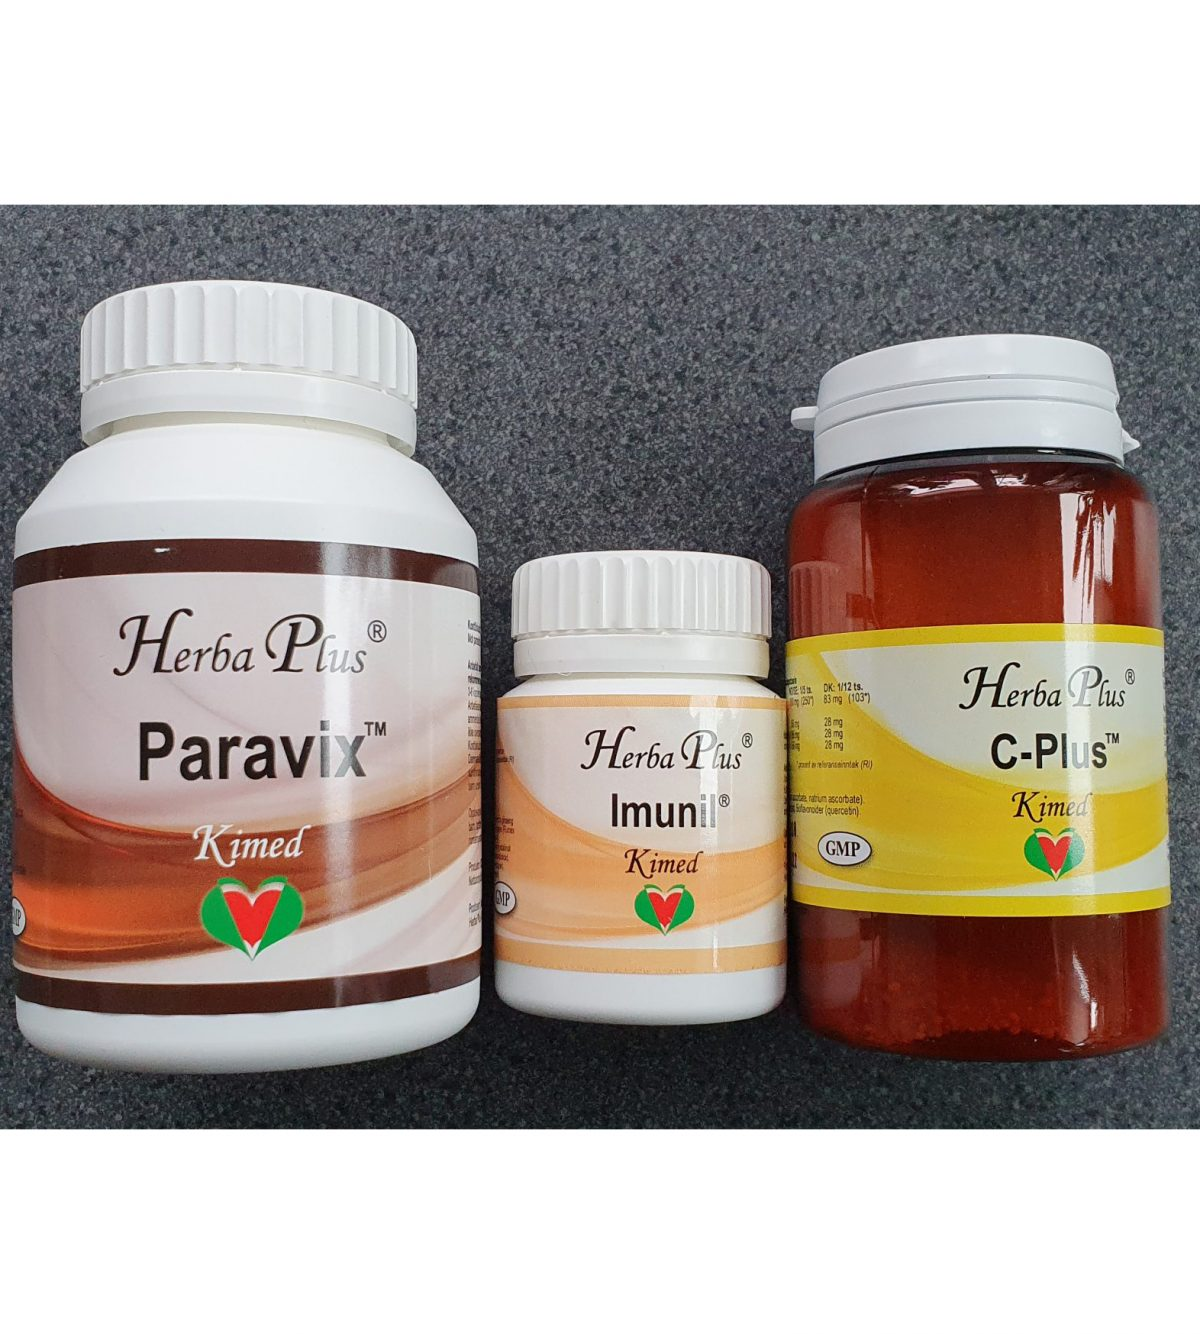 Virustider - Forebygg med Paravix, Imunil og C-Plus.